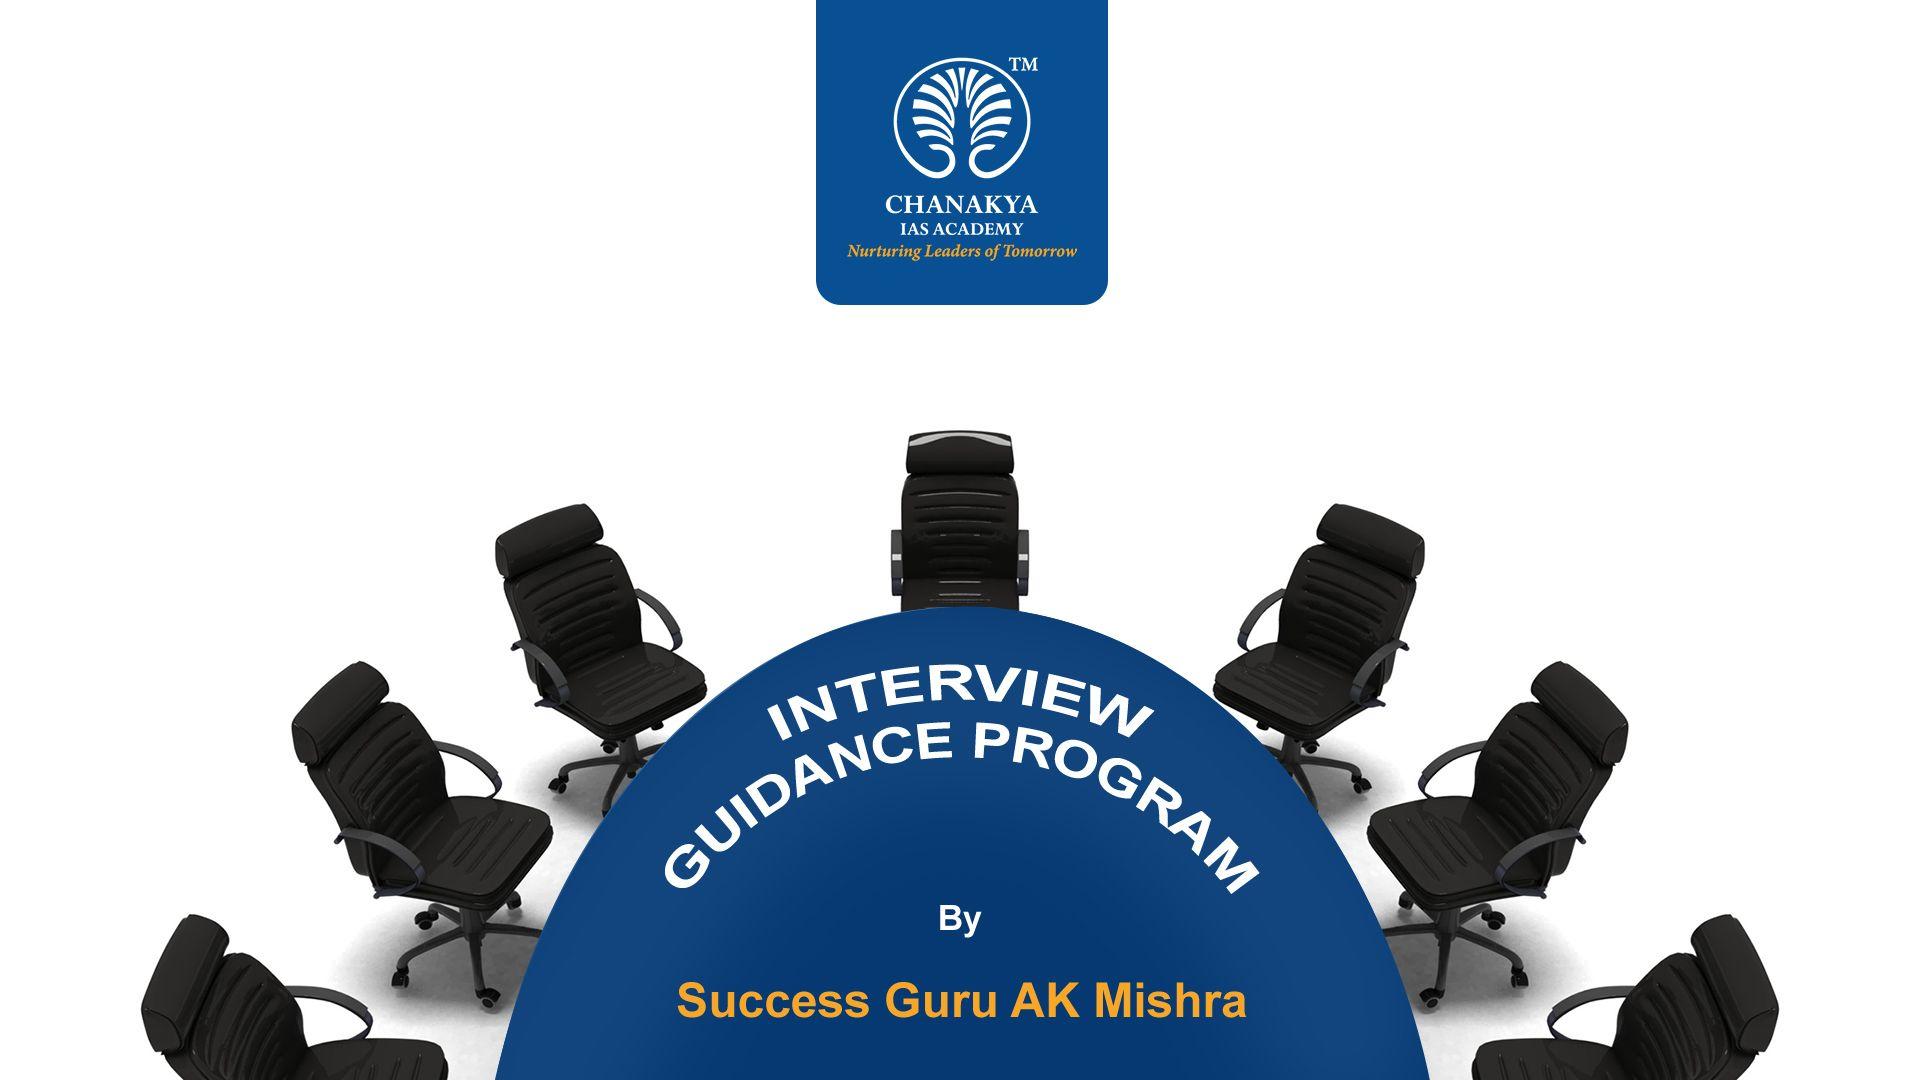 ChanakyaIasAcademy Initiates InterviewGuidanceProgram